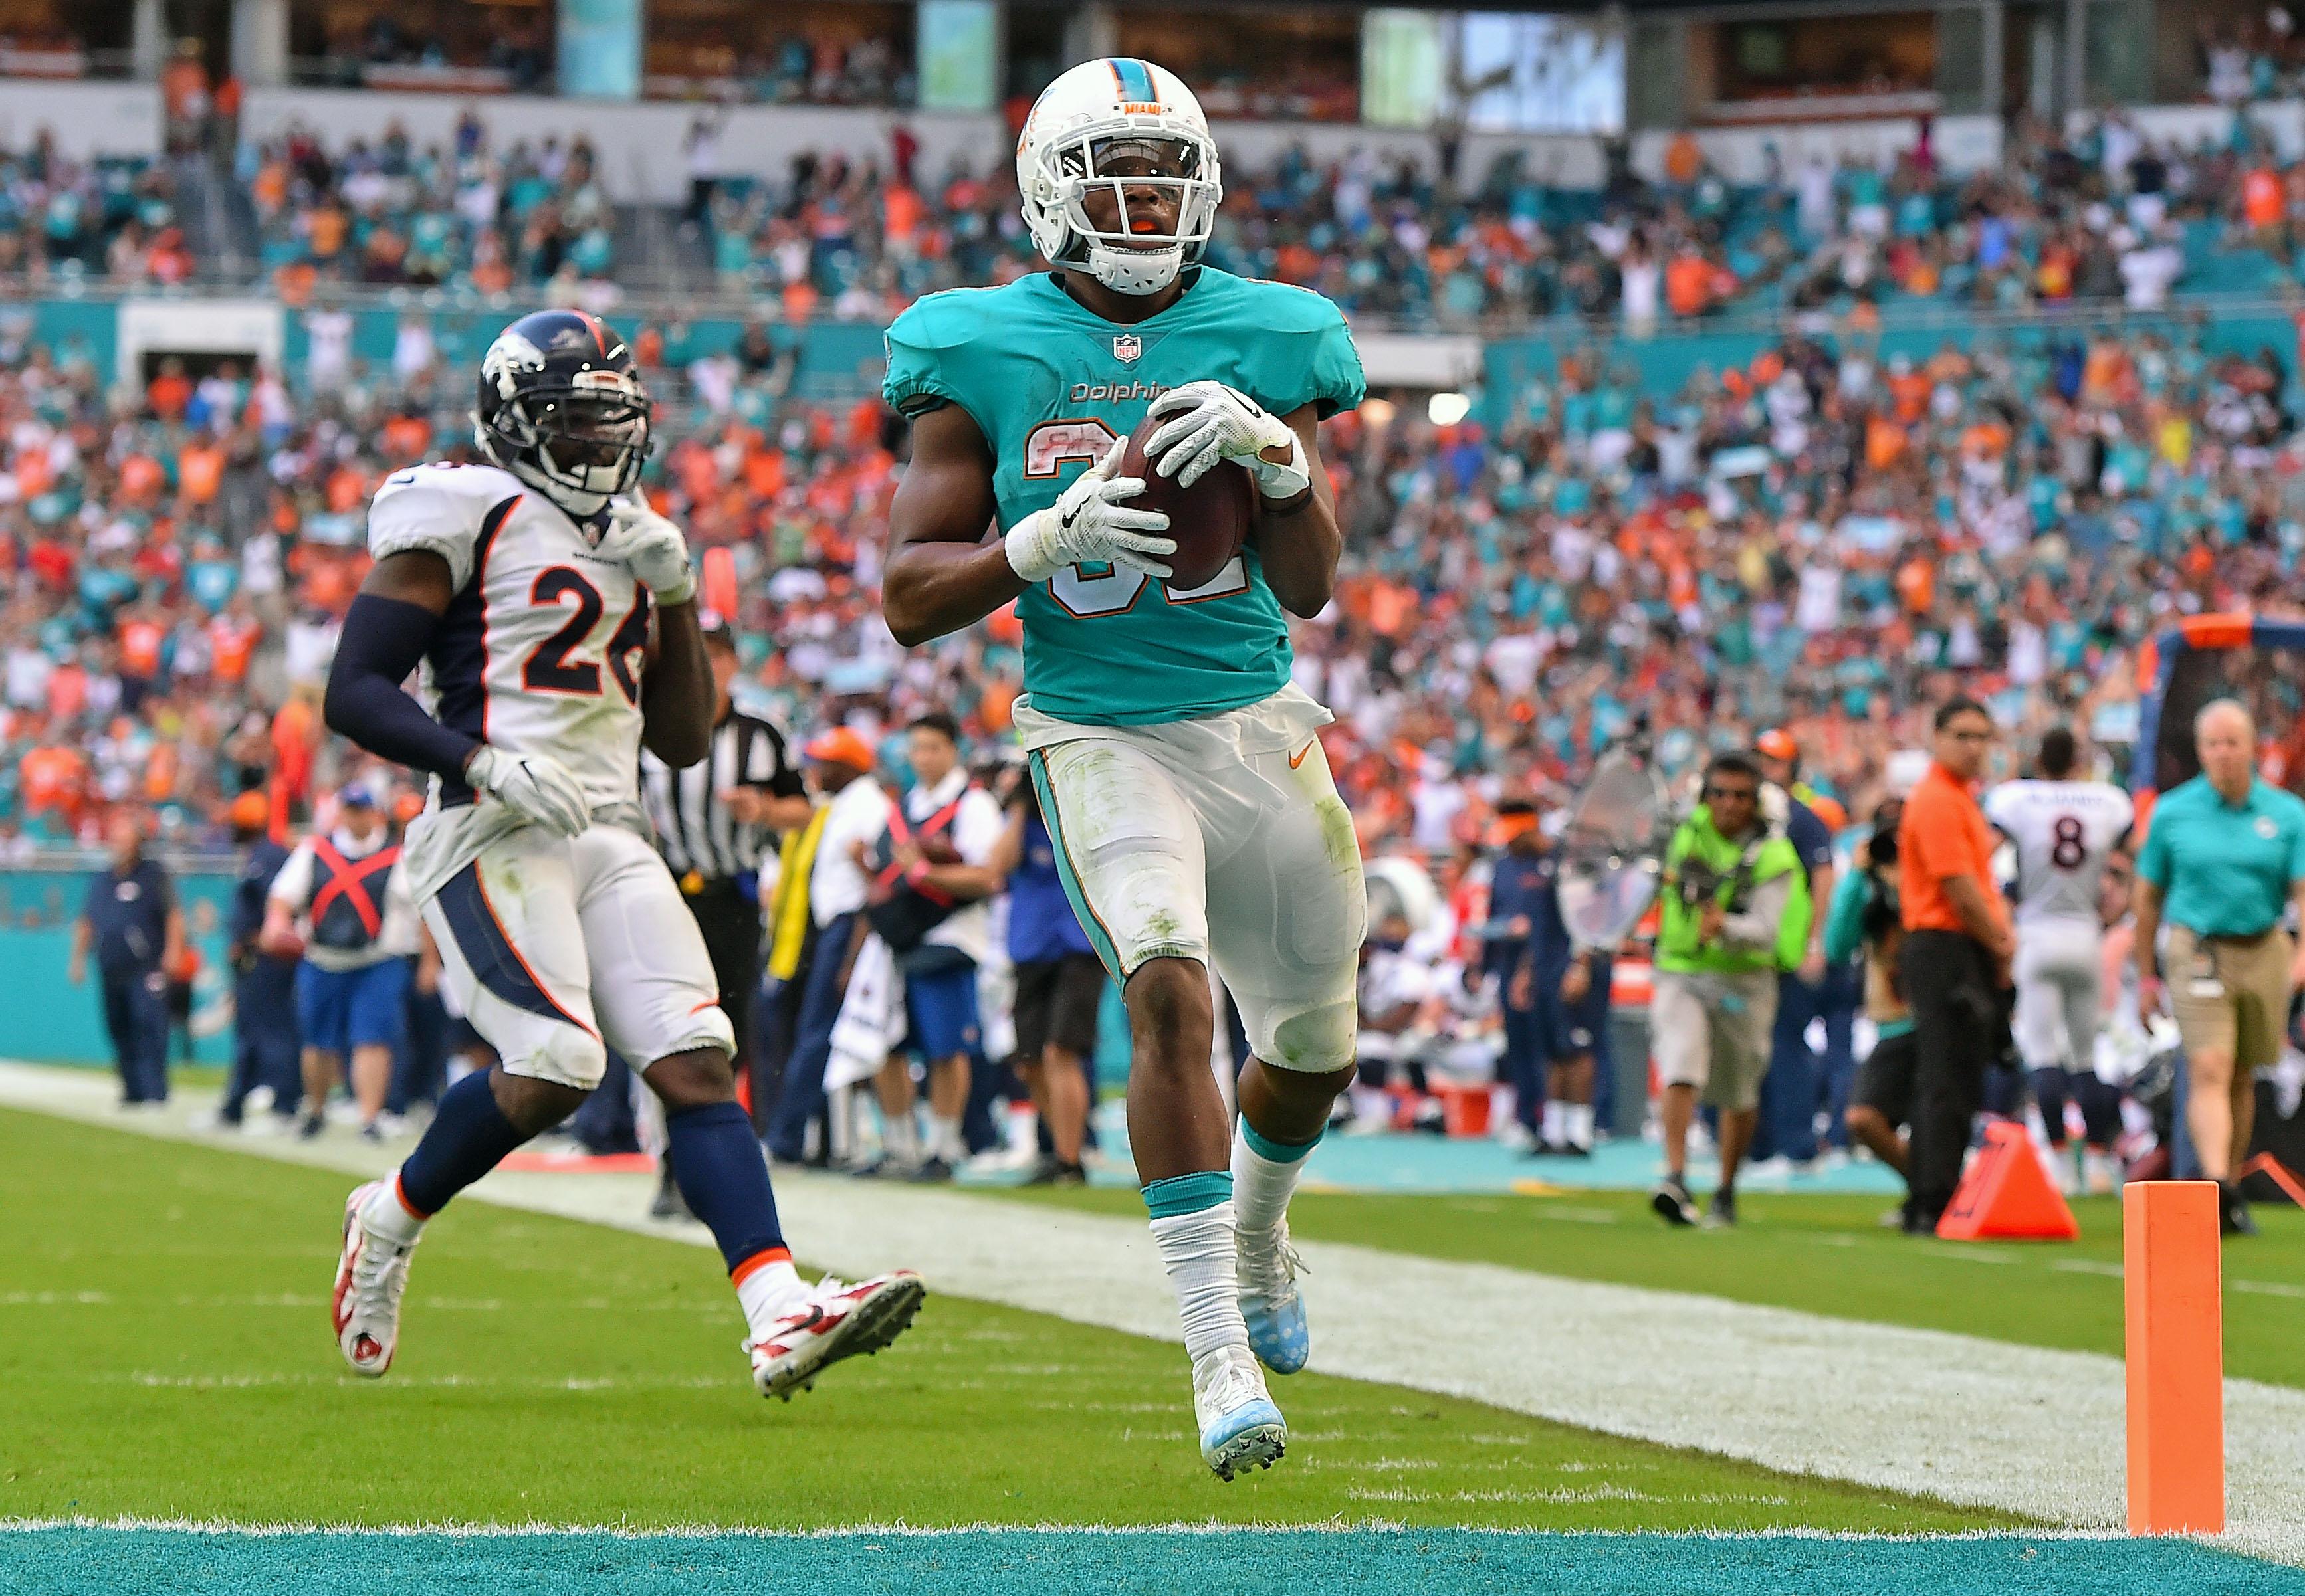 NFL: Denver Broncos at Miami Dolphins